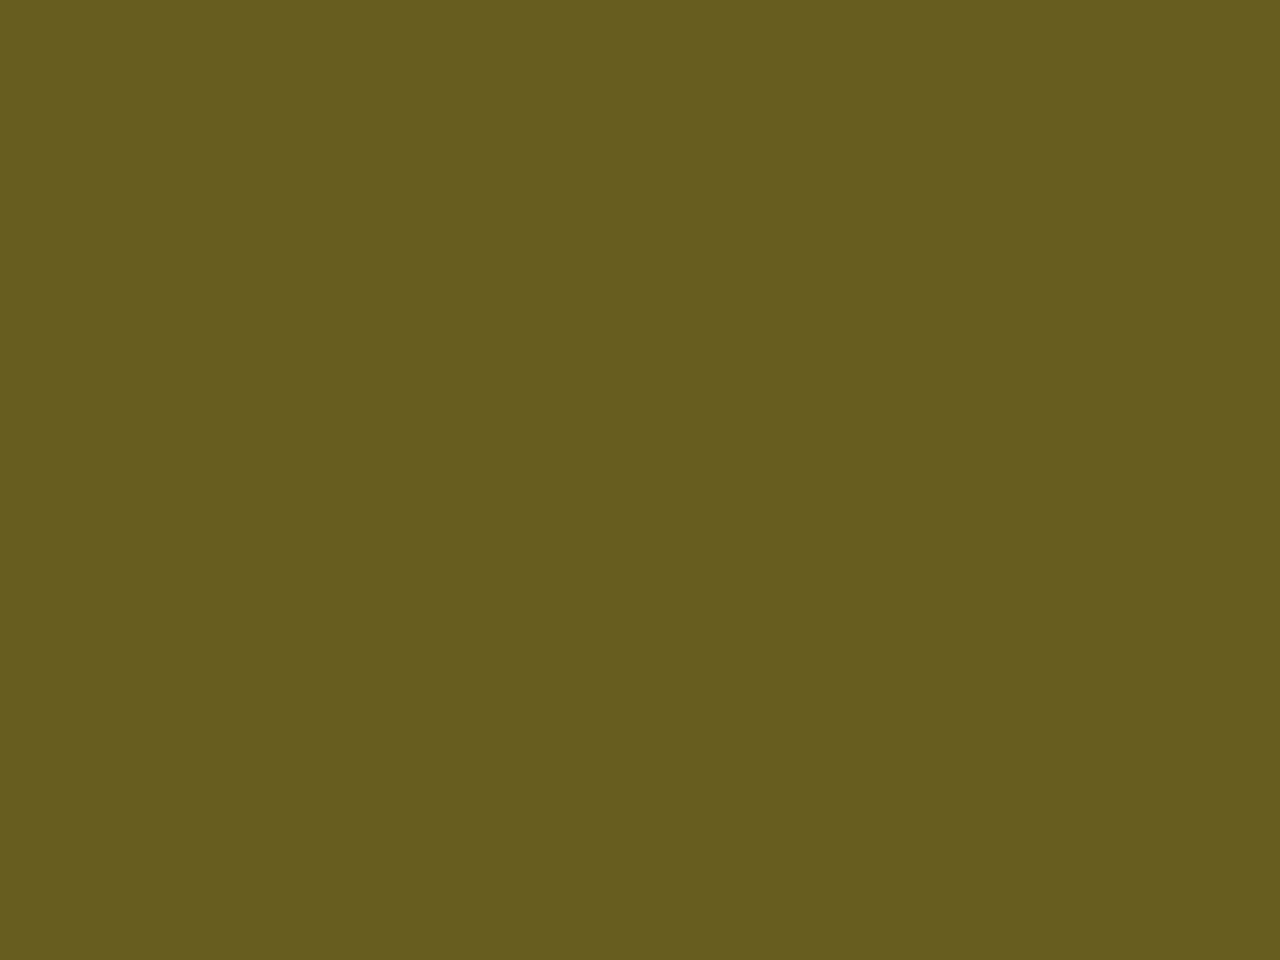 1280x960 Antique Bronze Solid Color Background